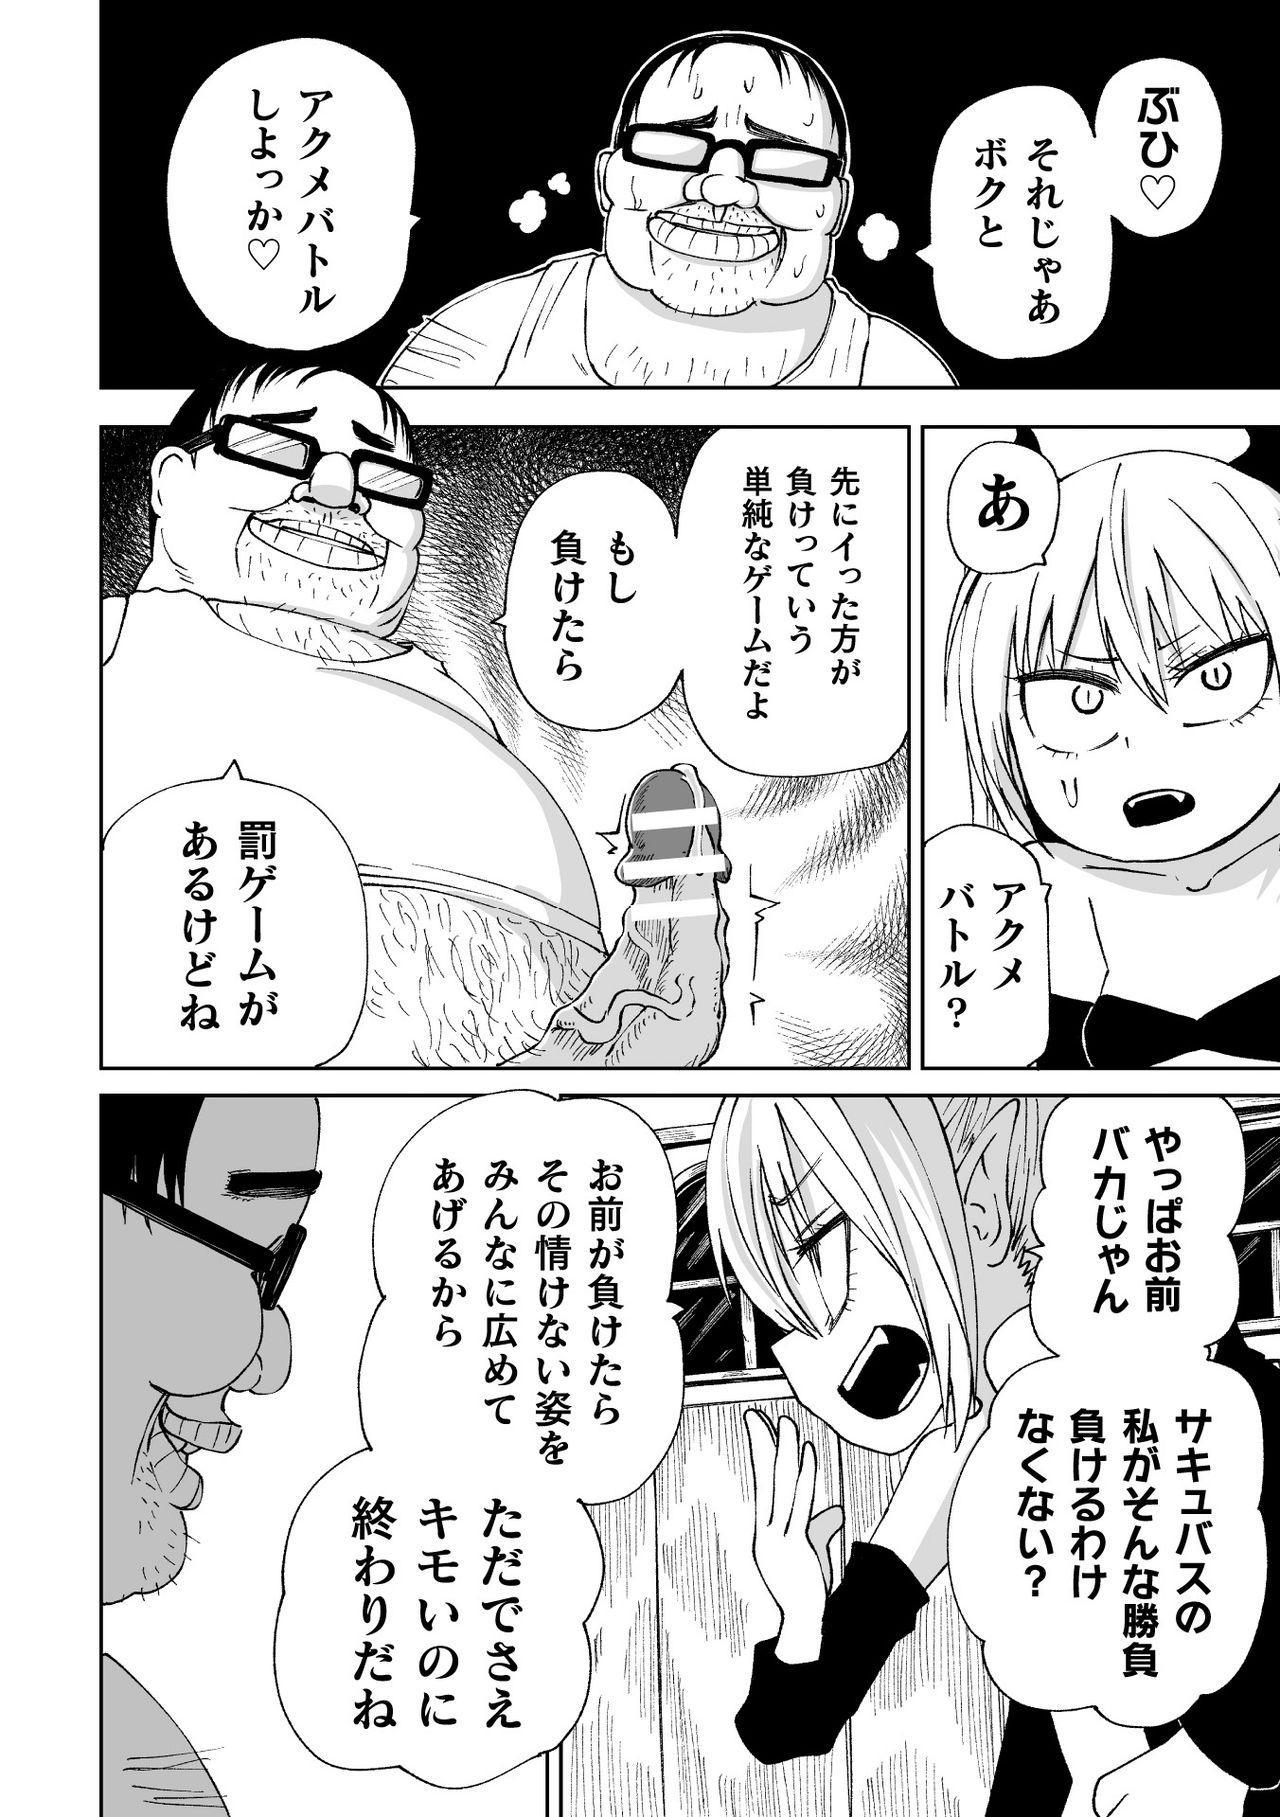 [Anthology] 2D Comic Magazine Mesugaki Succubus Seisai Namaiki Aka-chan Heya o Wakarase-bou de Kousei Knock Vol. 2 [Digital] 65